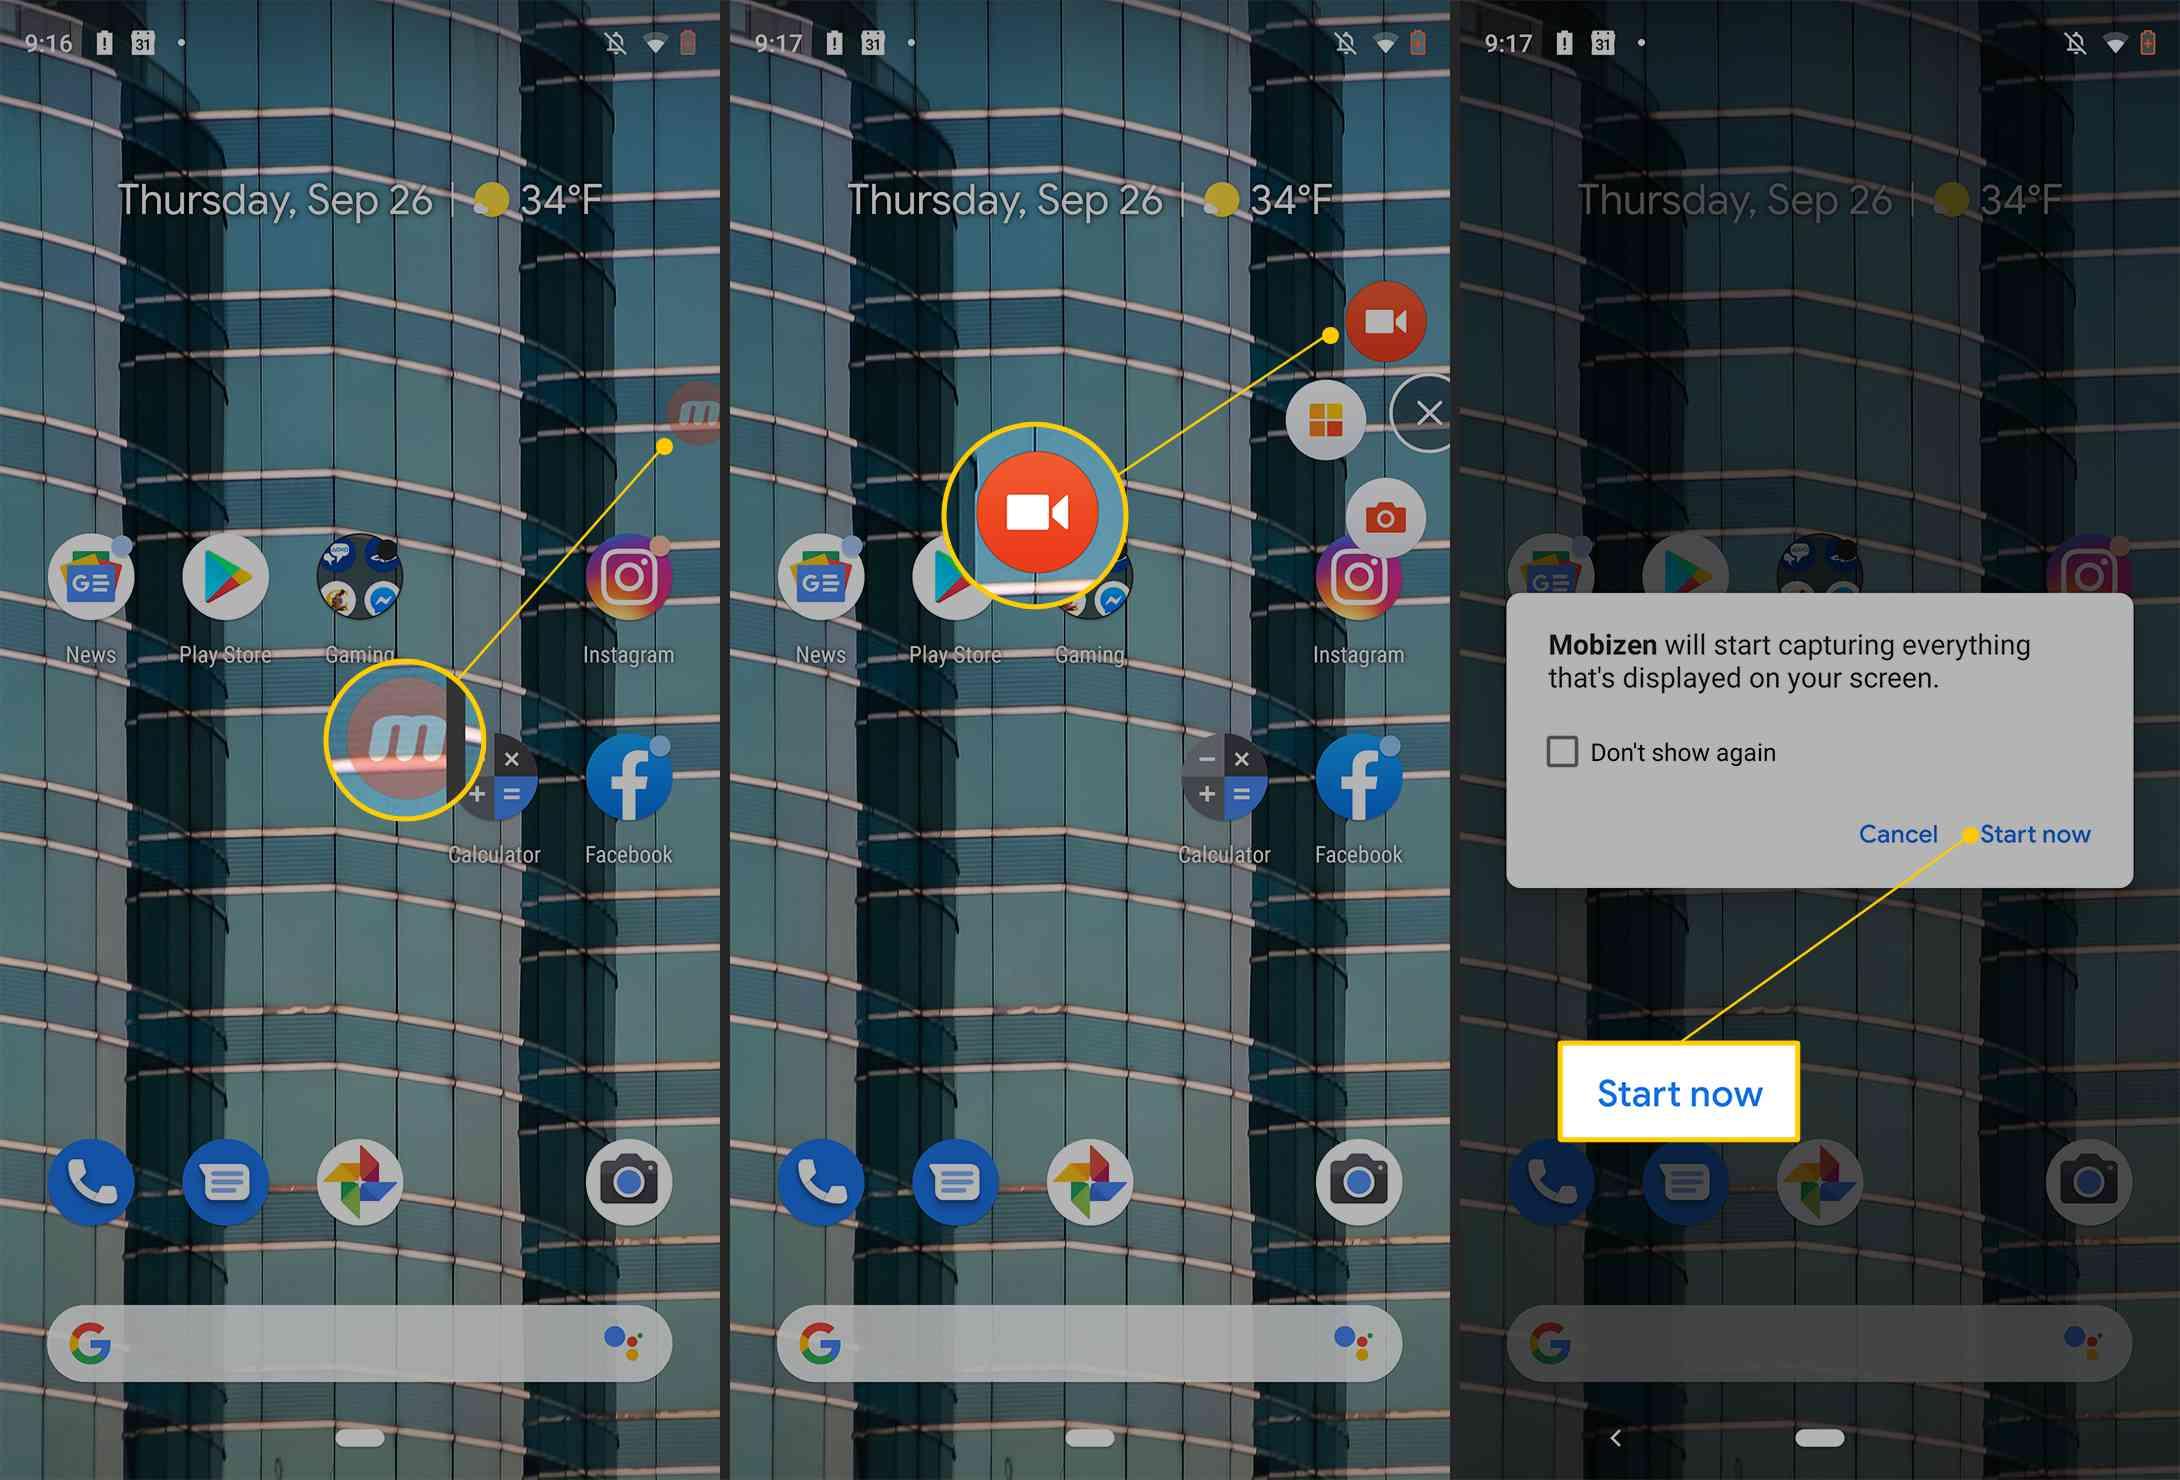 Mobizen icon, record screen video button, Start now button